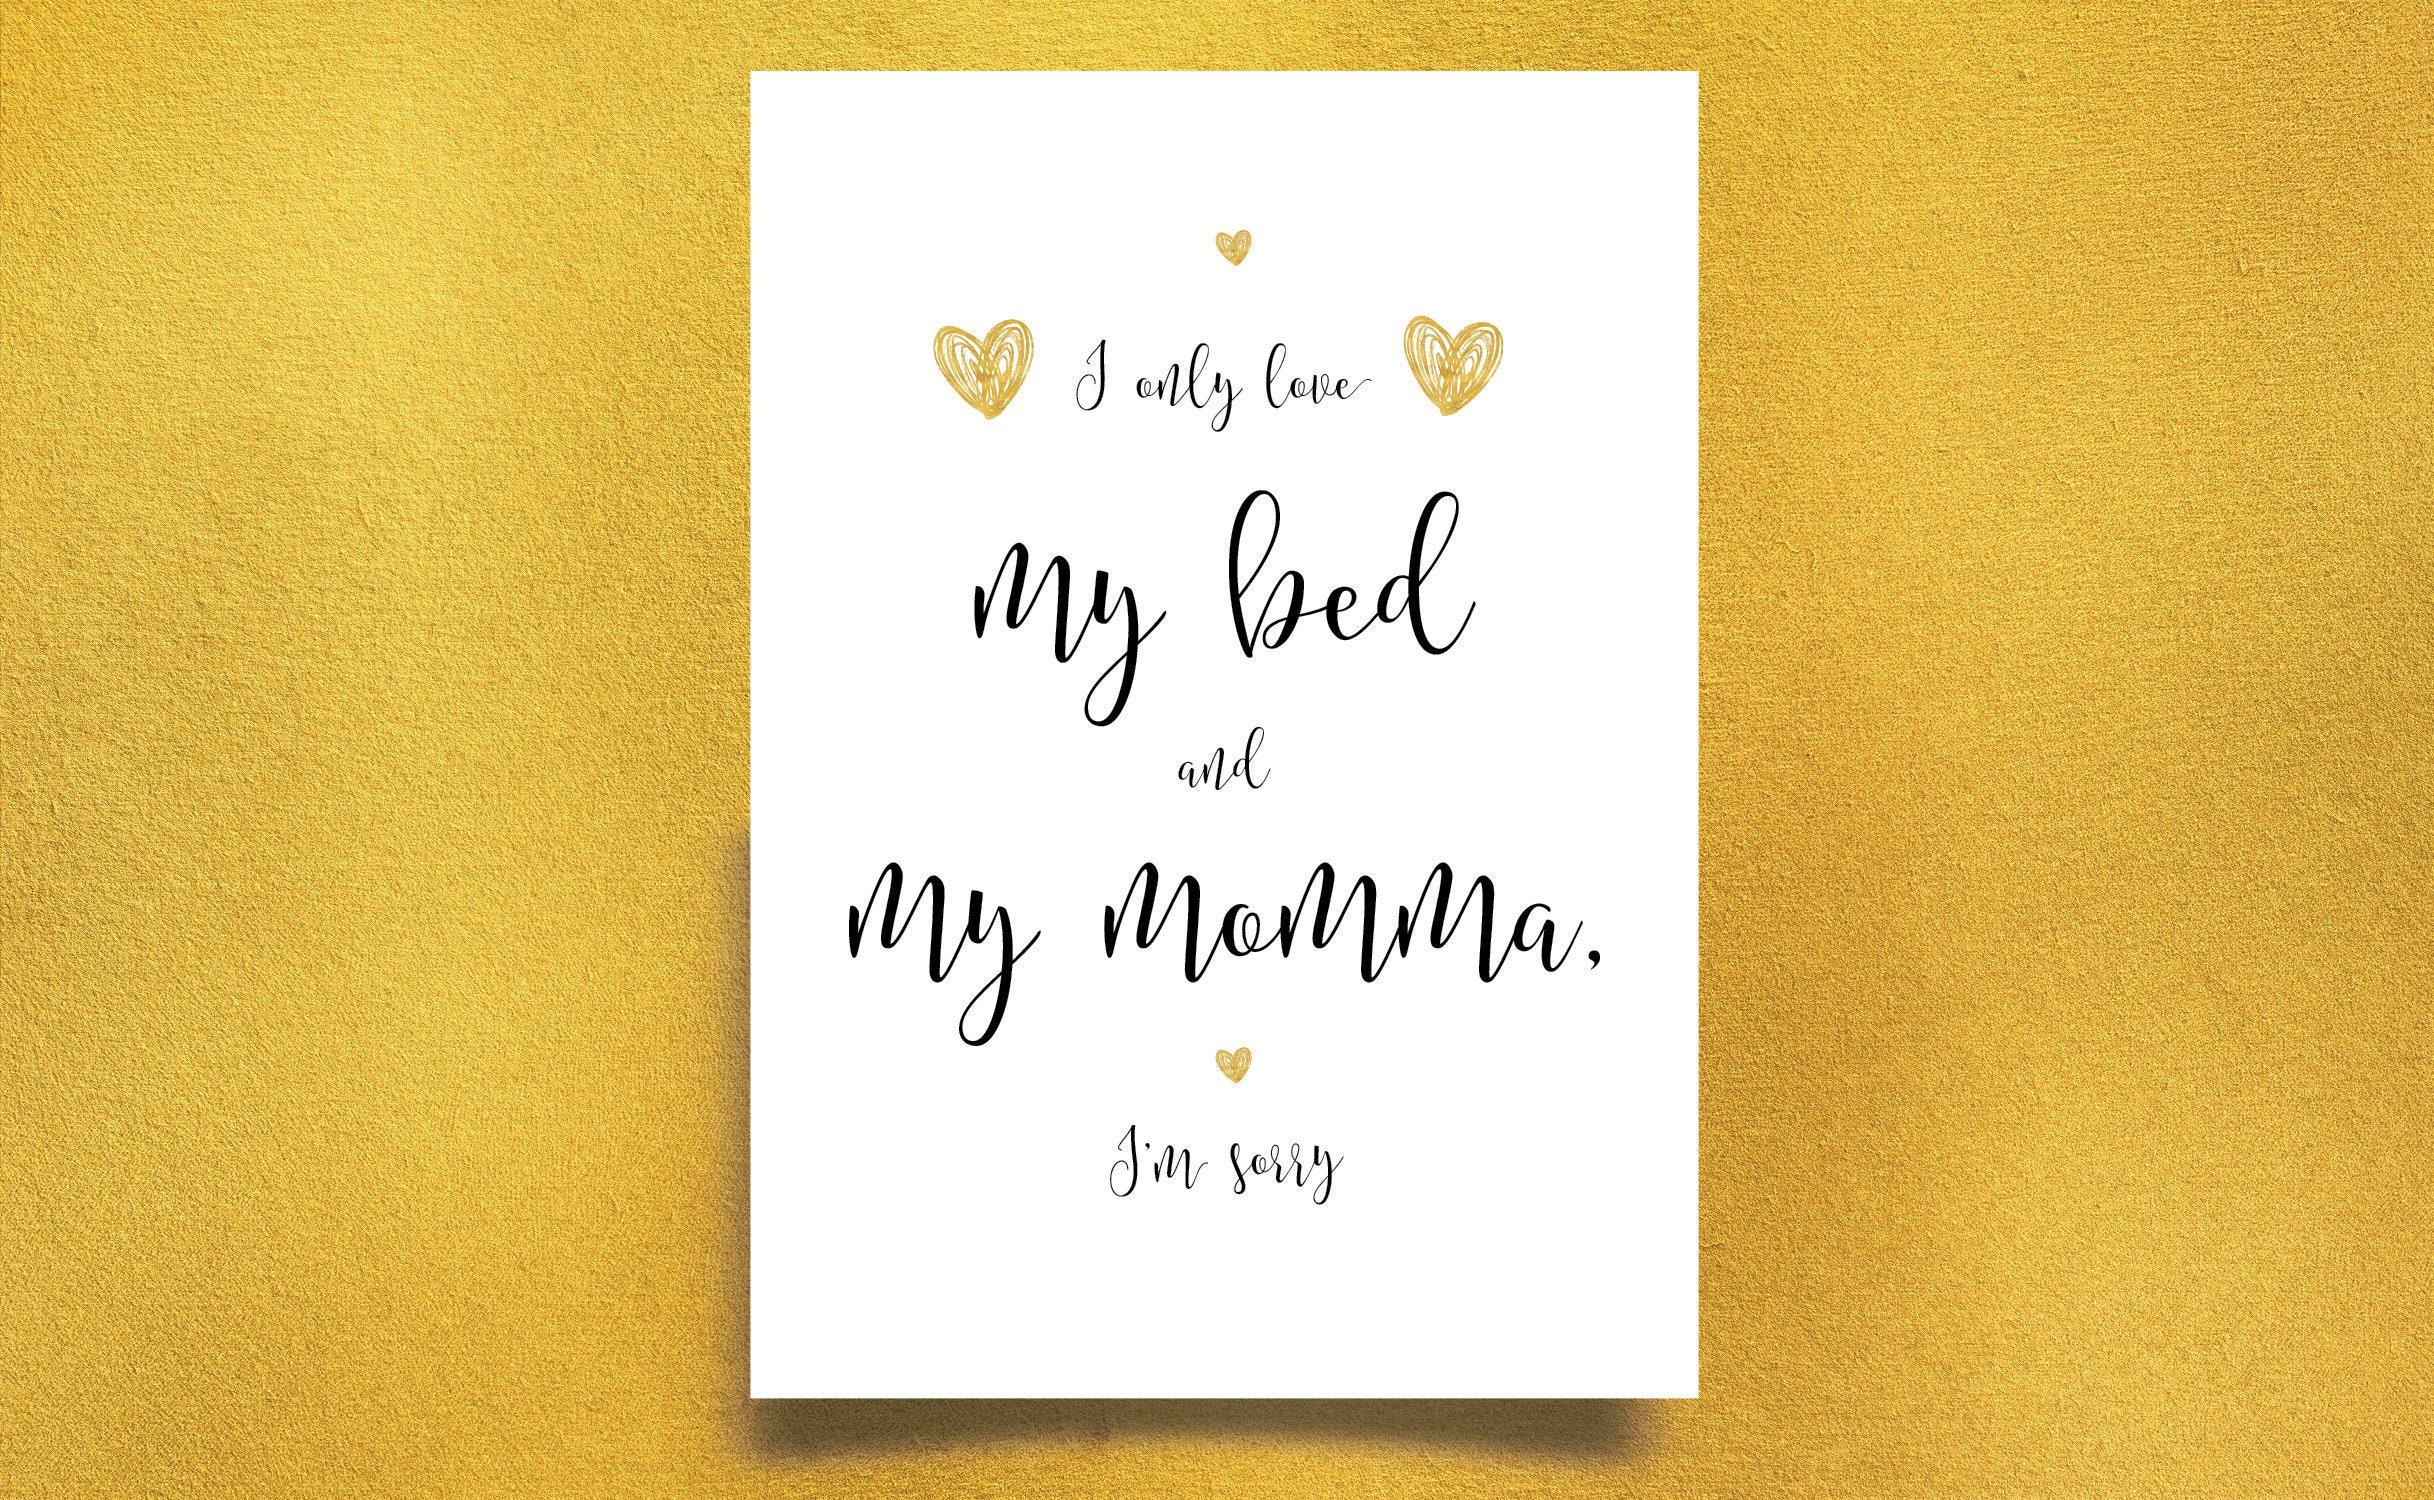 Nursery PrintI only love my be & my mommaNursery Wall | Etsy